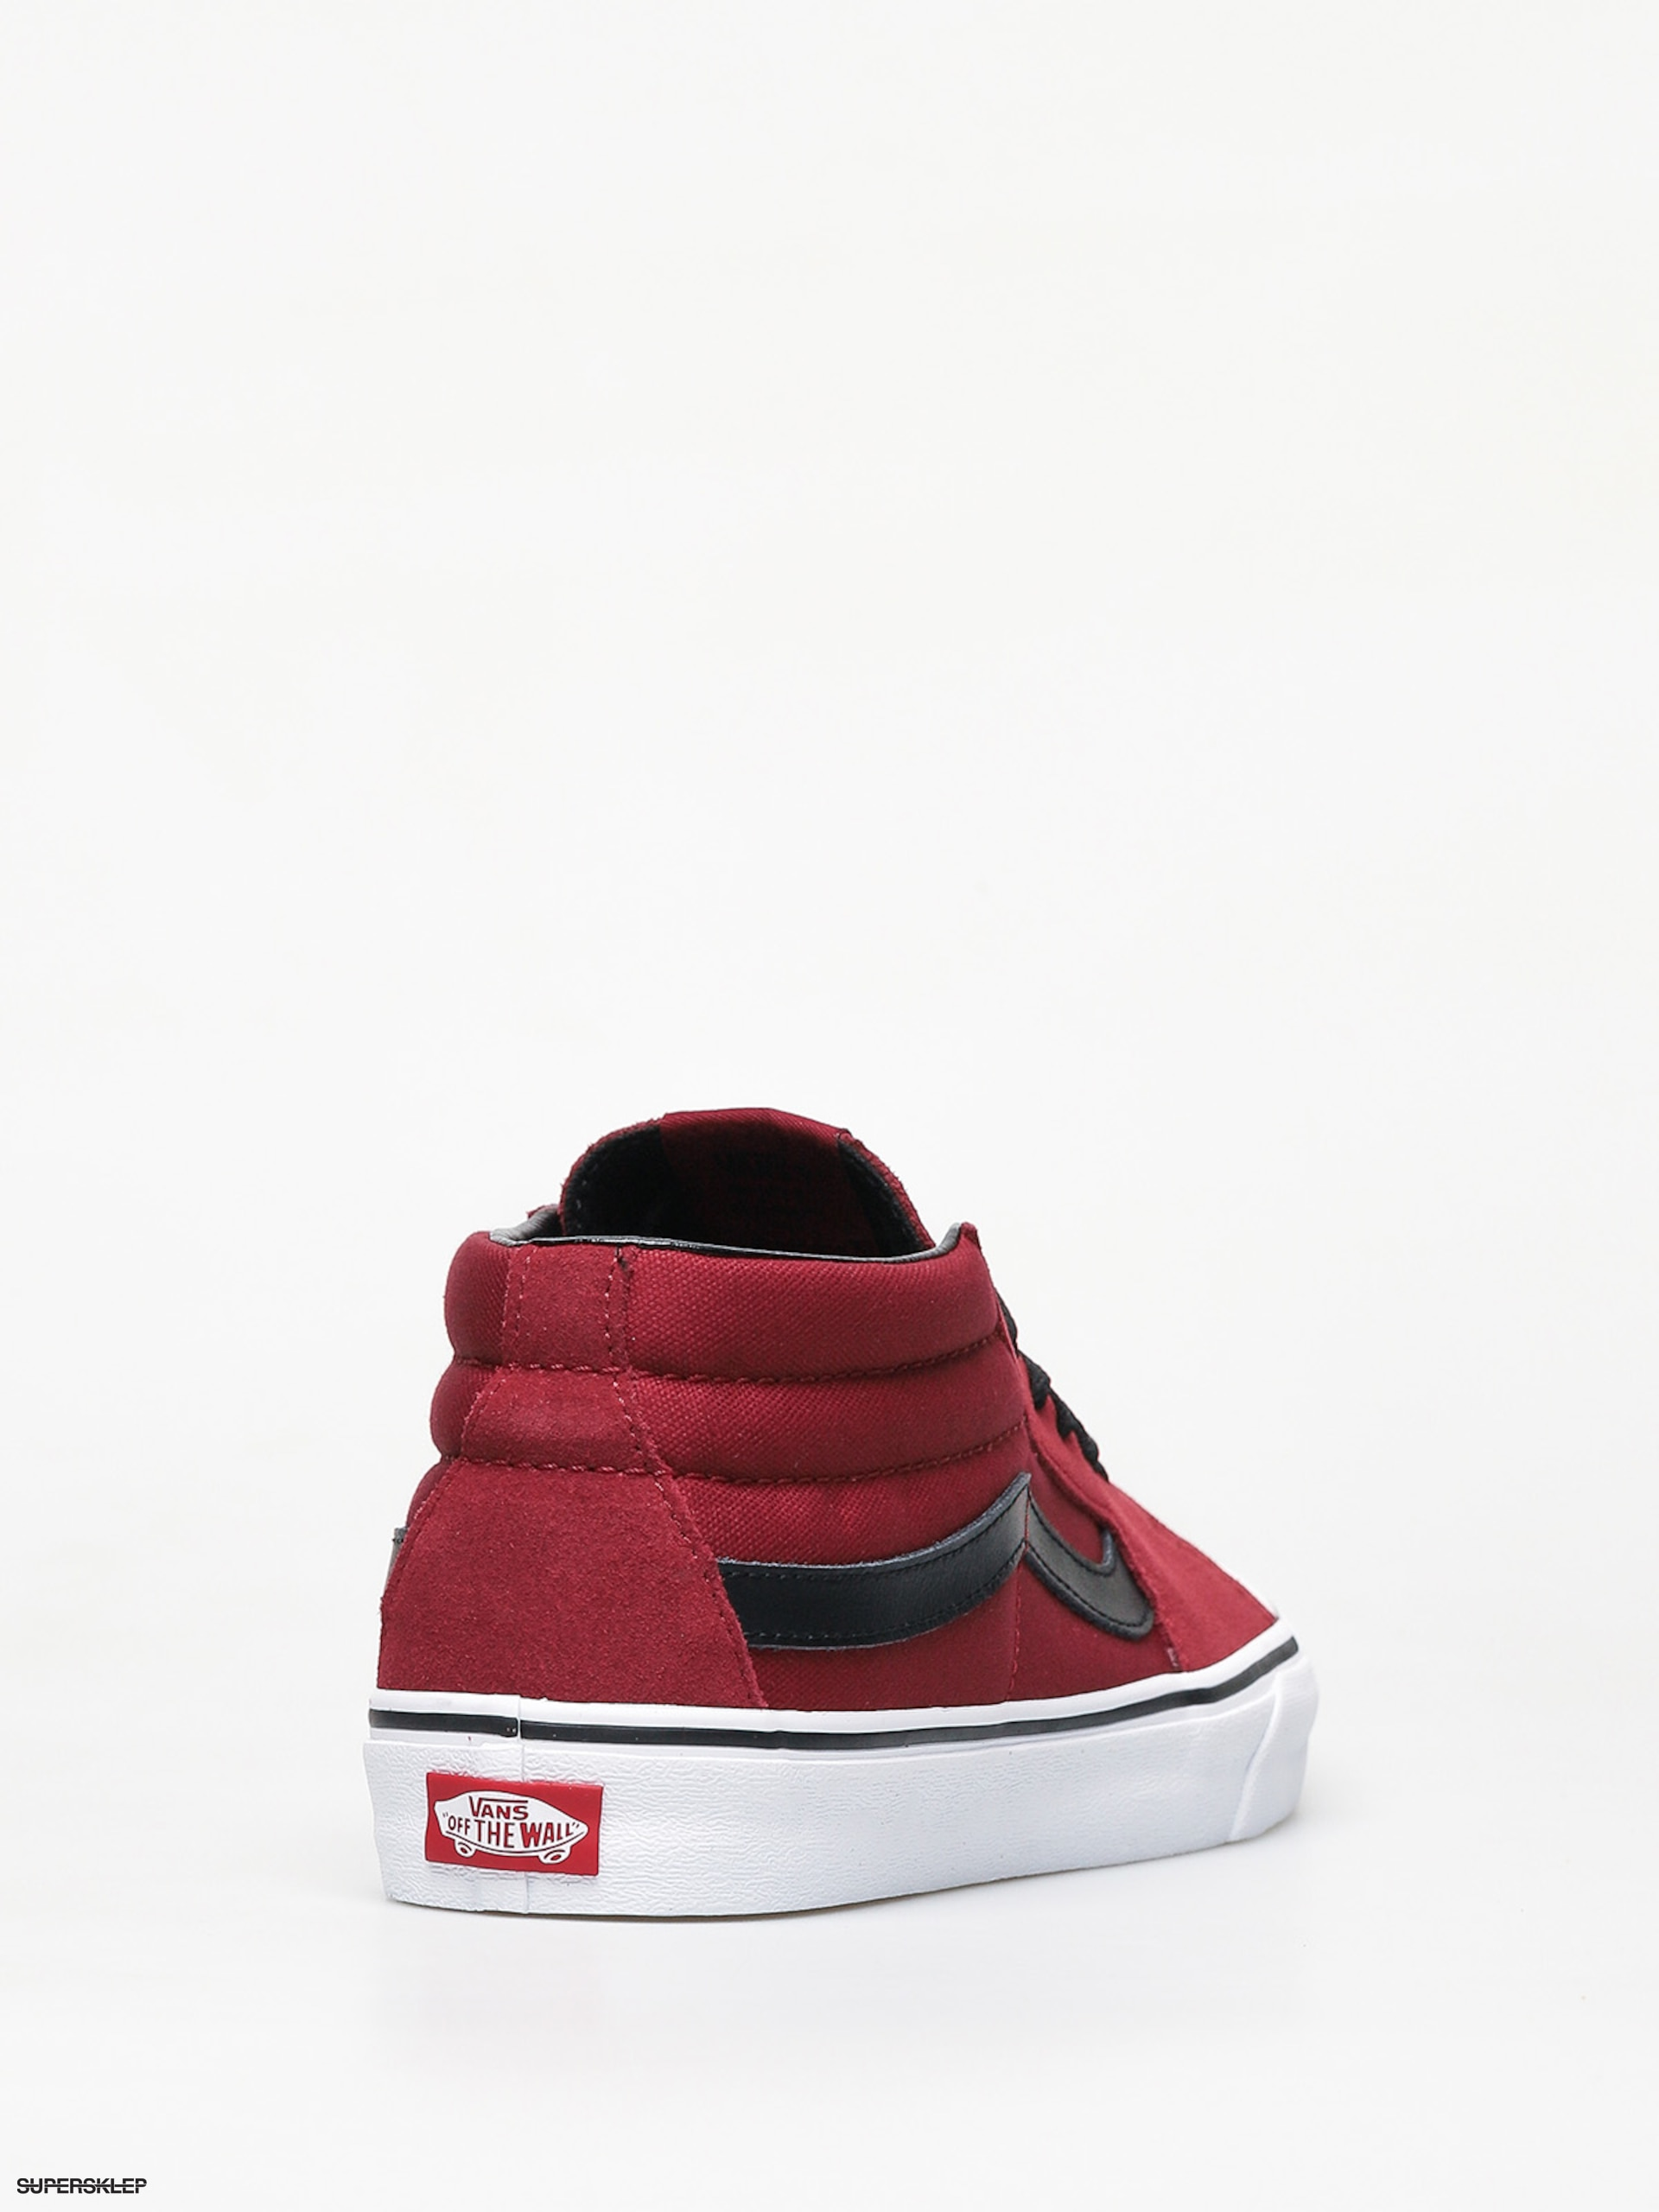 Vans Sk8 Mid Shoes (biking redtrue white)